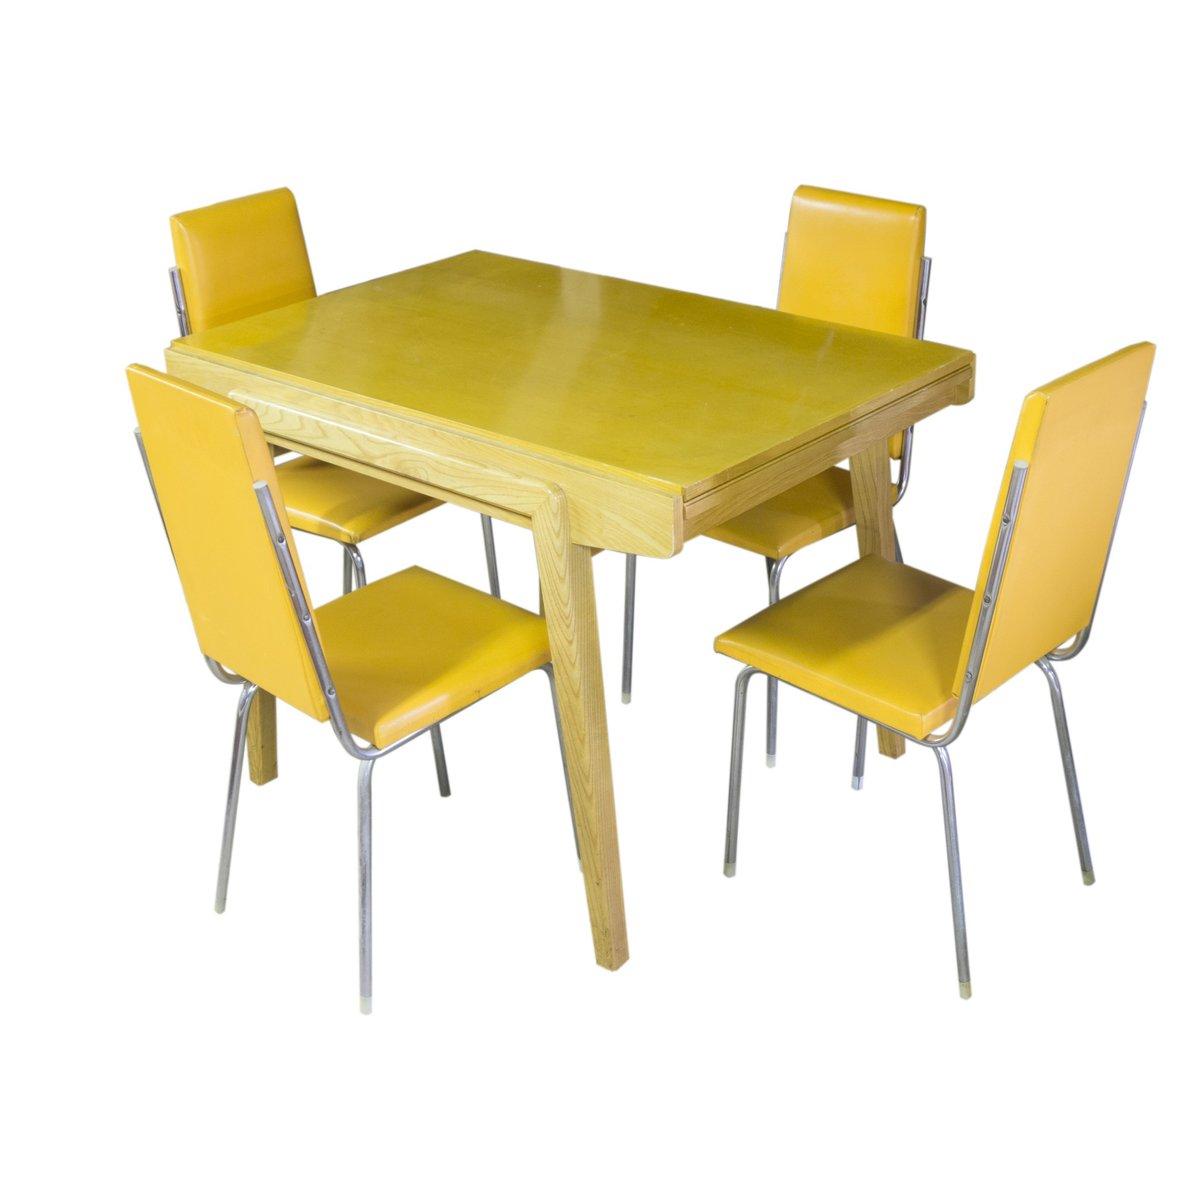 Stunning Tavoli Da Cucina Pieghevoli Pictures - Design & Ideas 2017 ...